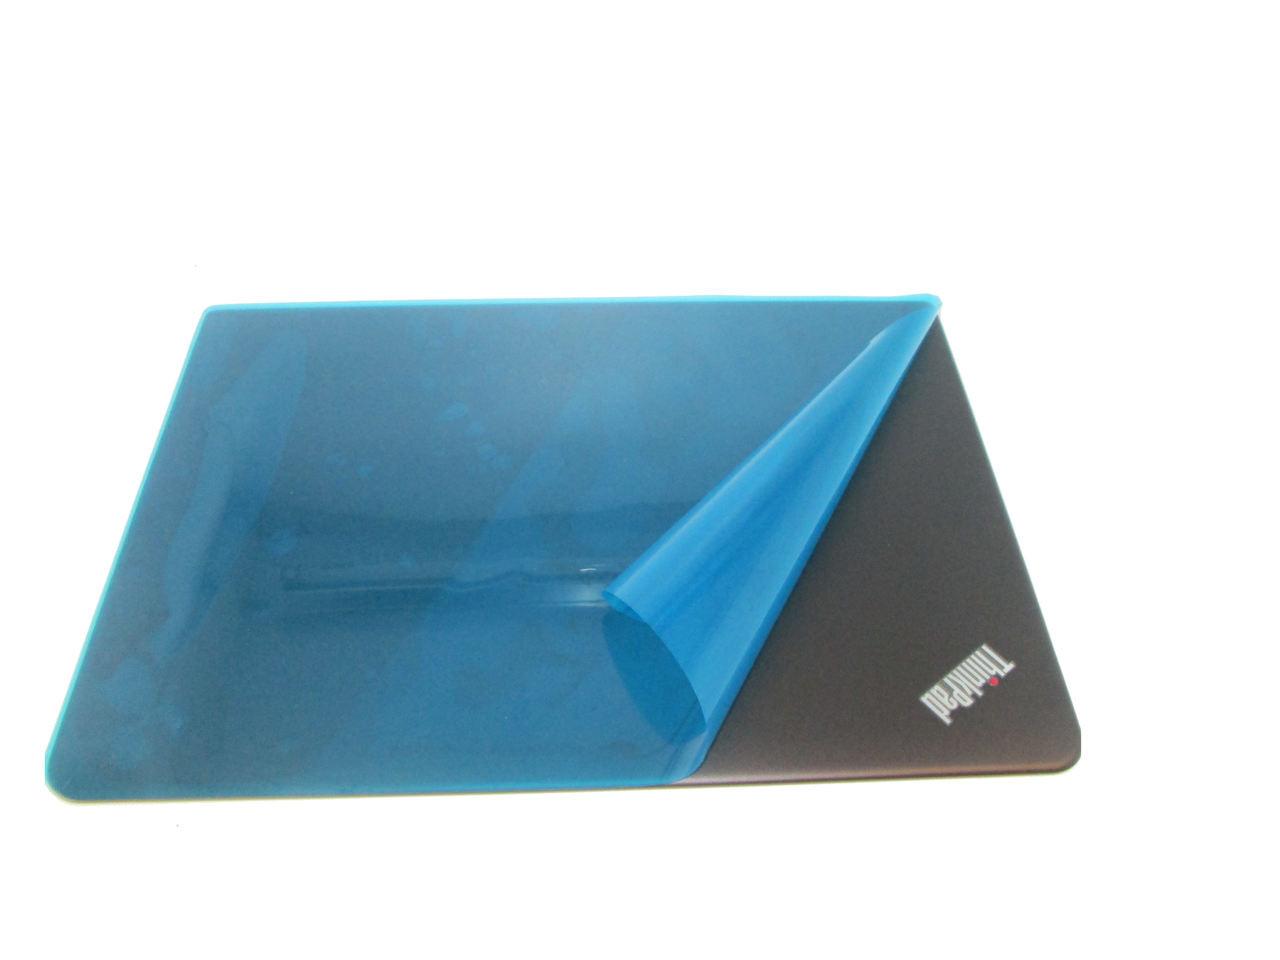 AP0TR000600 00HN652 for Lenovo ThinkPad Edge E450 E455 Lcd Back Cover Plastic